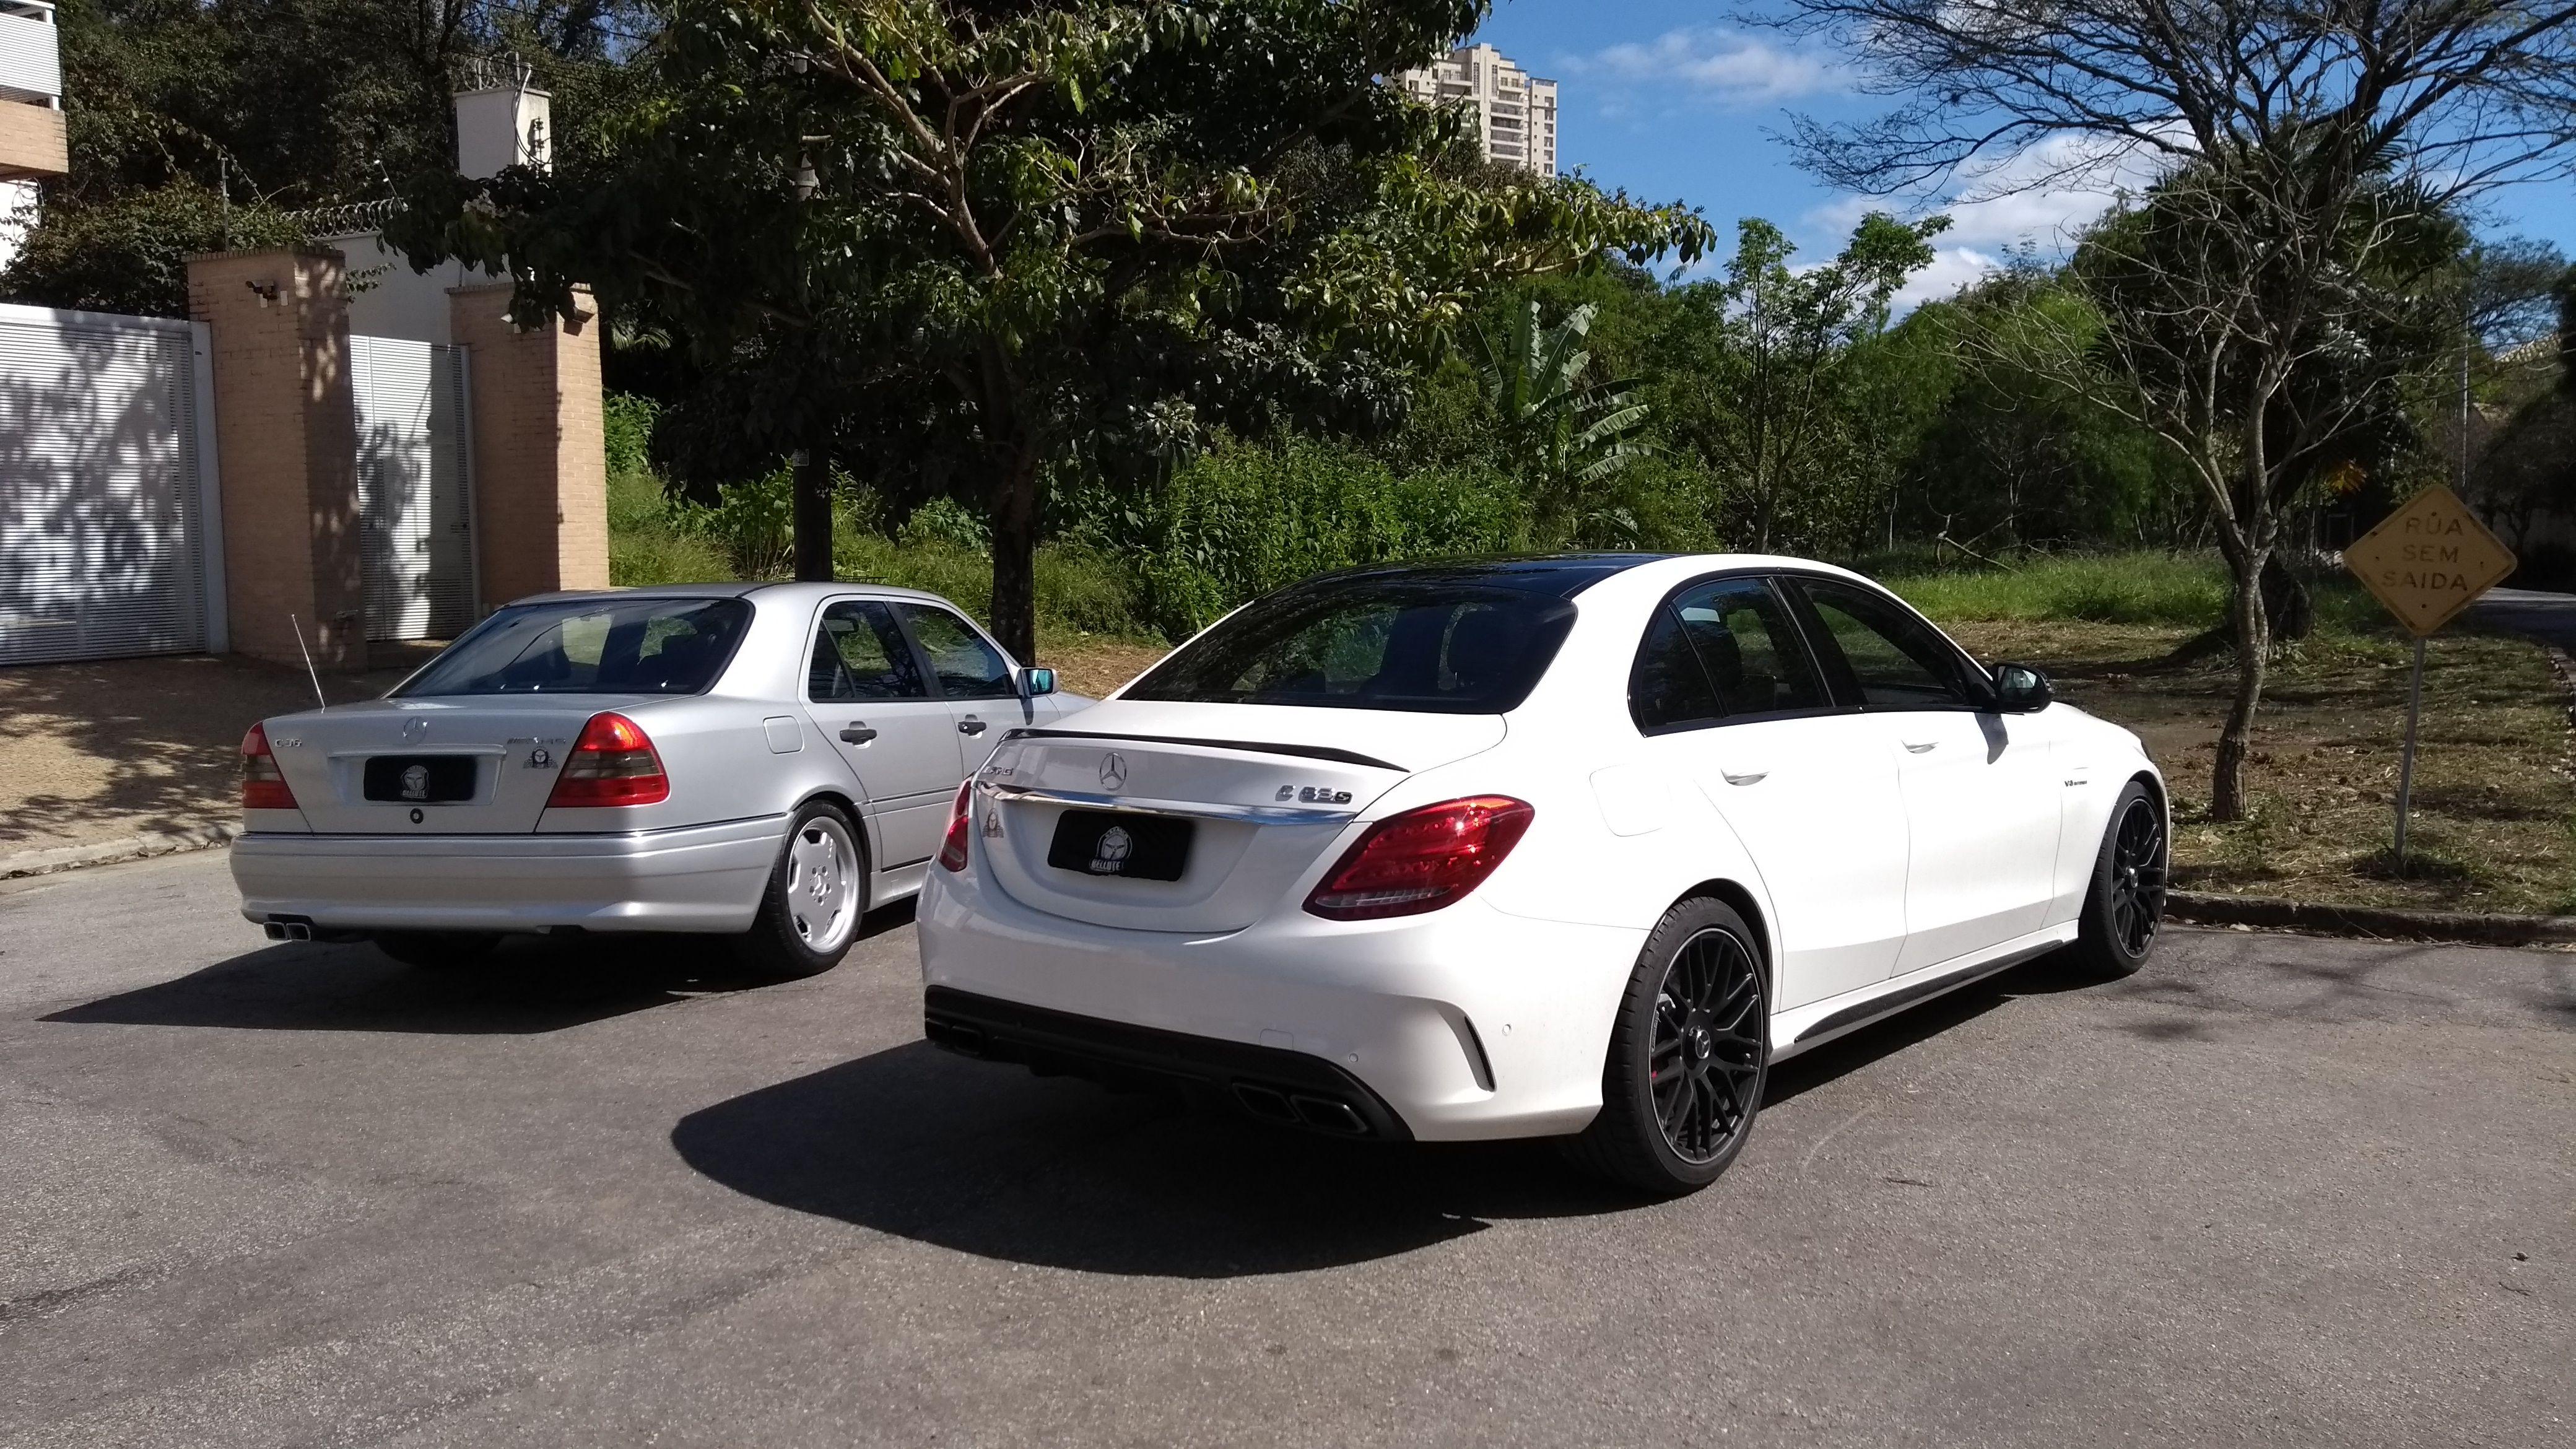 Mercedes Benz C36 AMG e Mercedes AMG C63 S